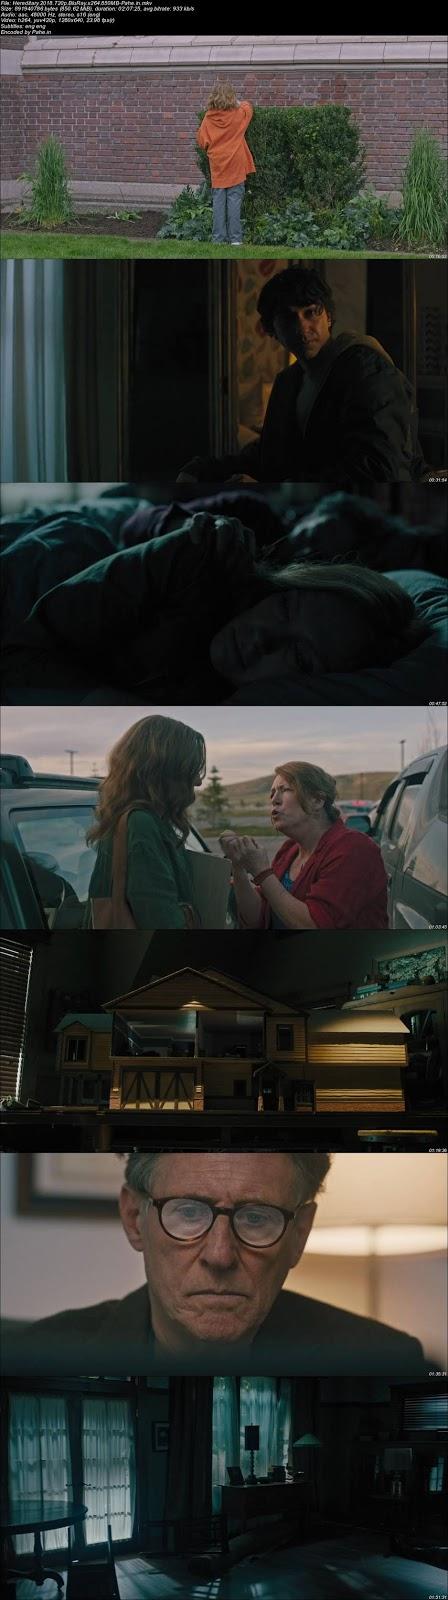 Hereditary (2018) English 480p 720p BRRip Download - Film4me